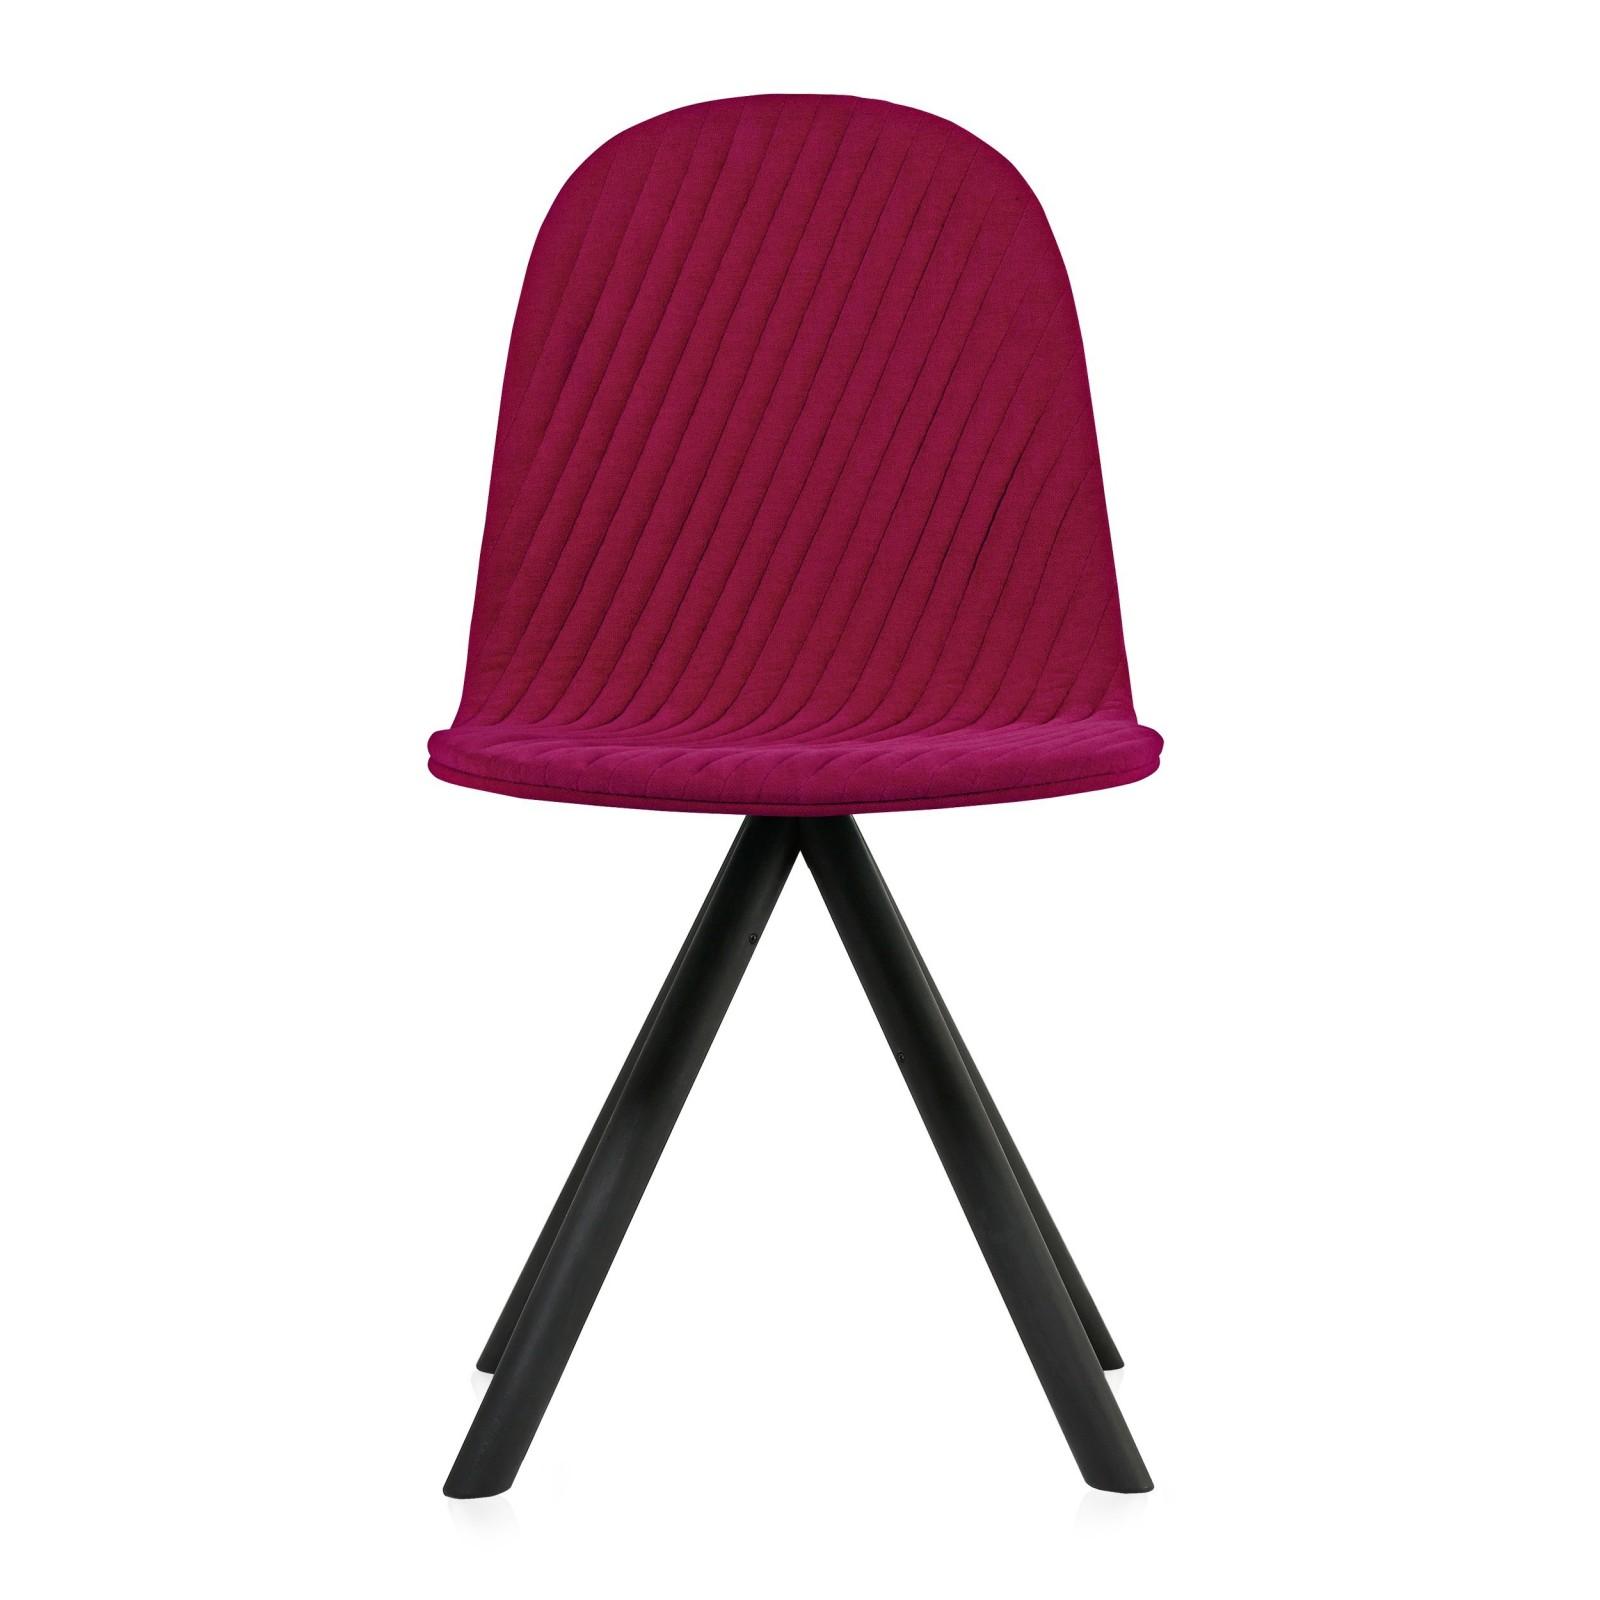 Mannequin chair - 01 - amaranth